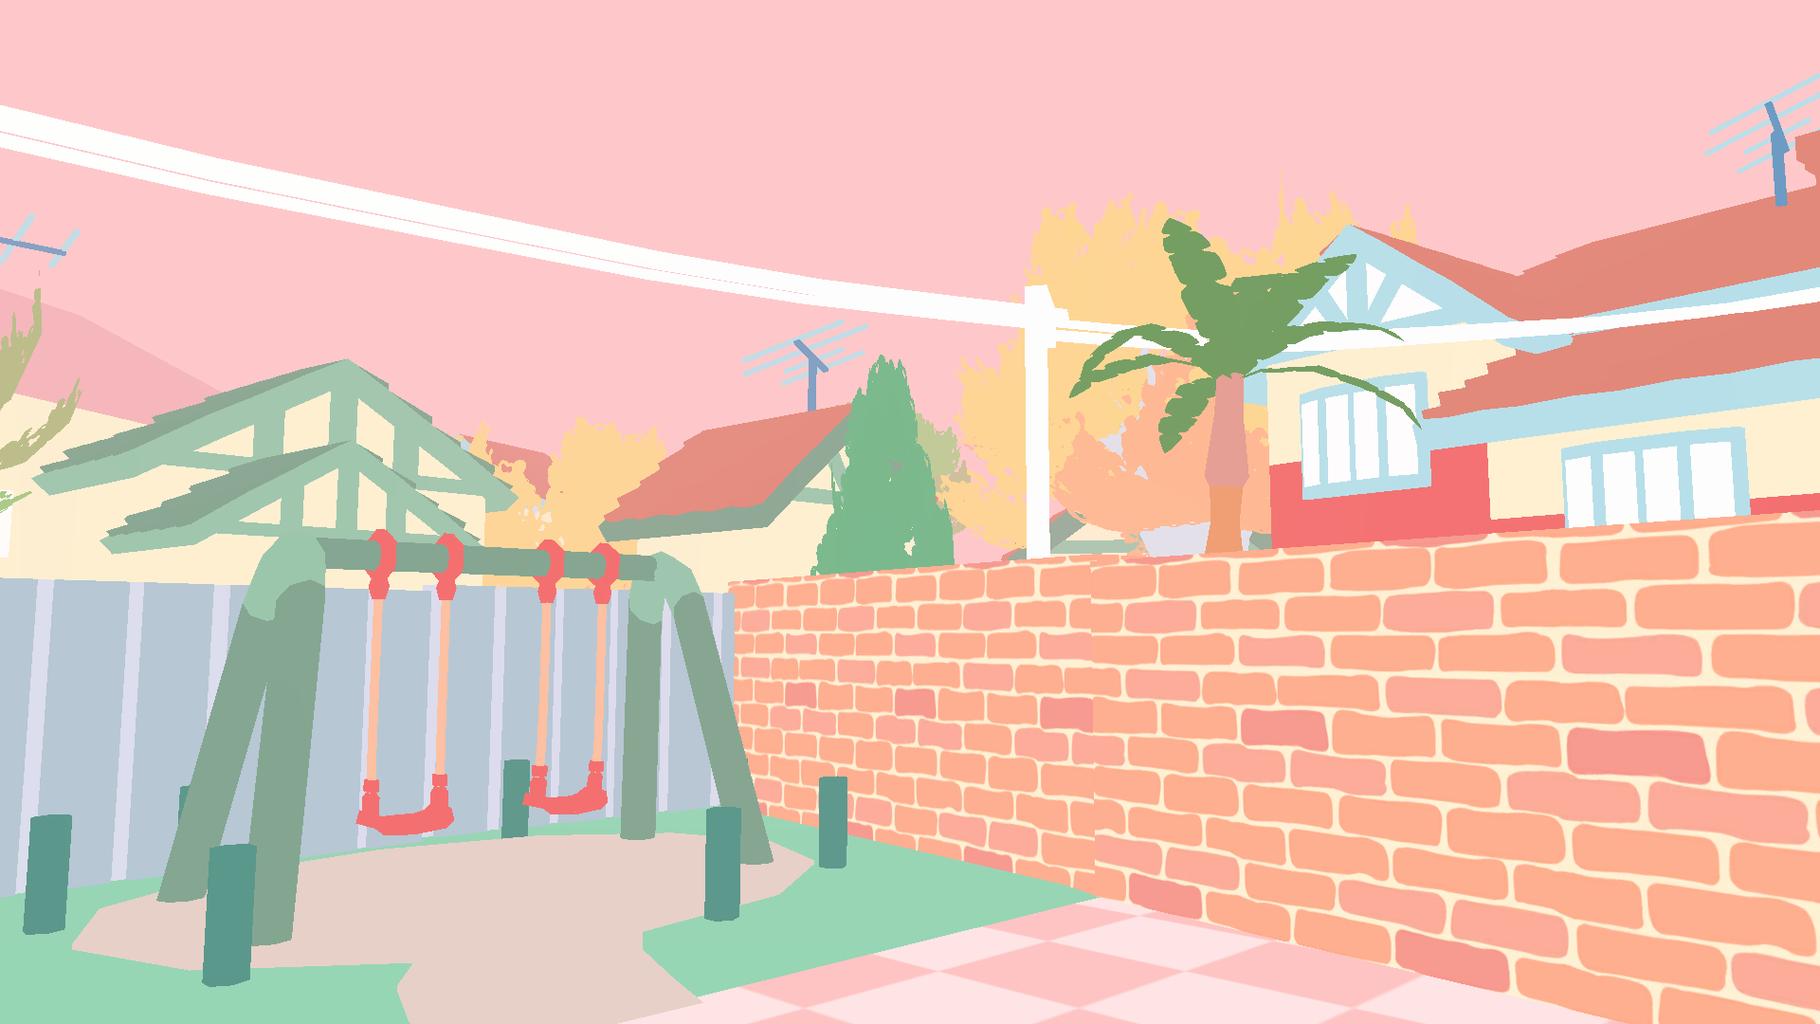 A screenshot of Terracota by Olivia Haines - hero image